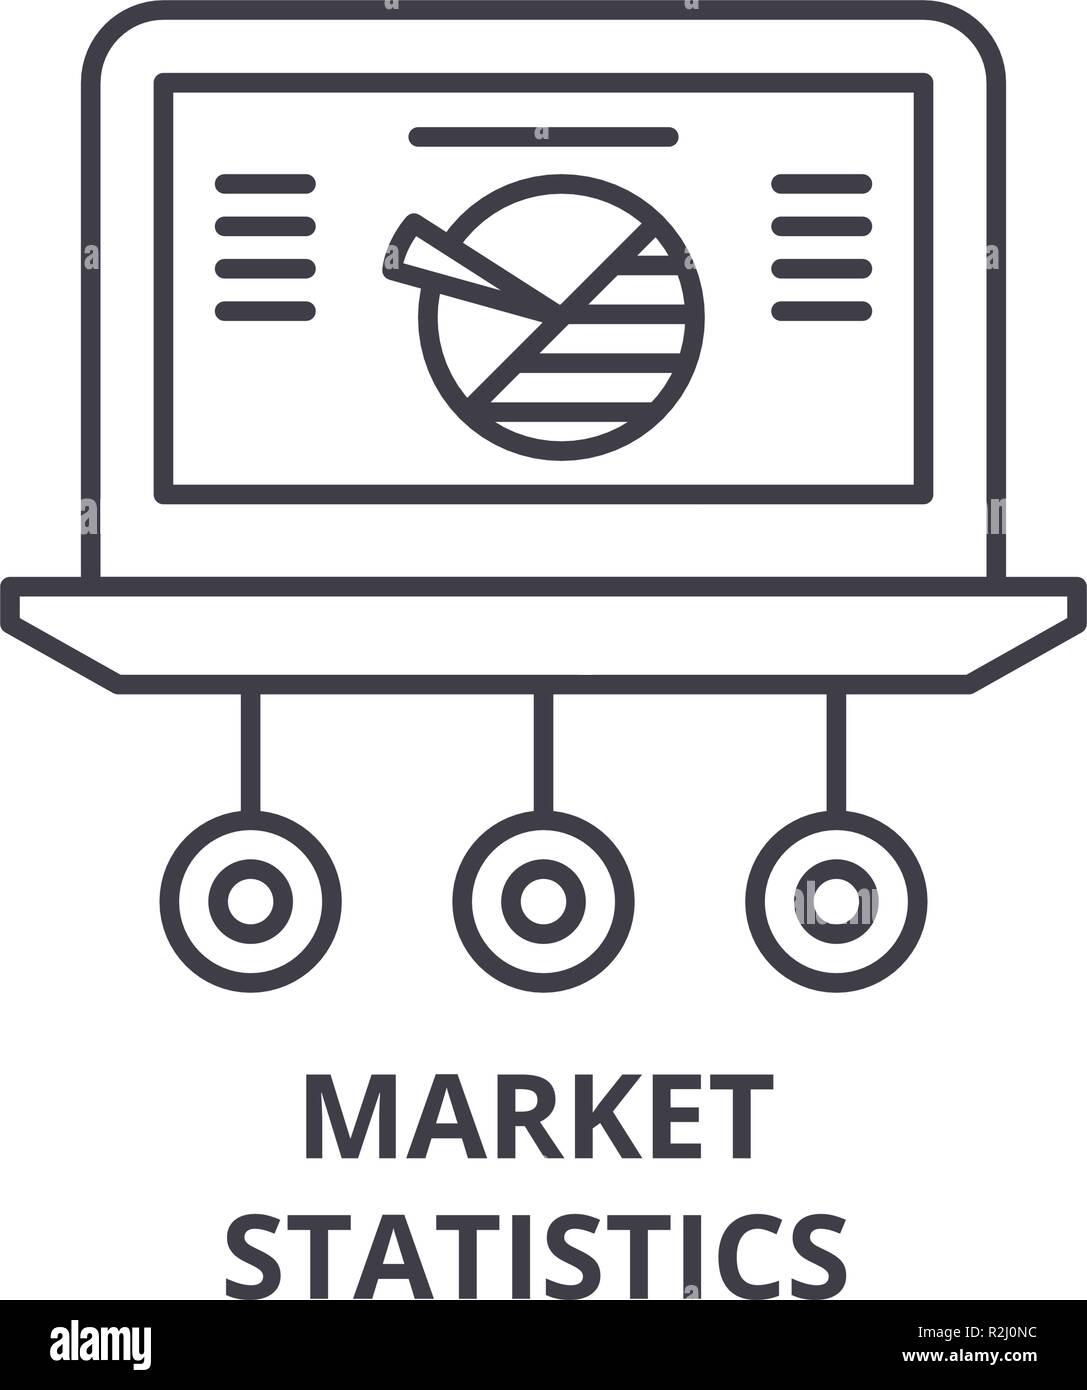 Market statistics line icon concept. Market statistics vector linear illustration, symbol, sign - Stock Image